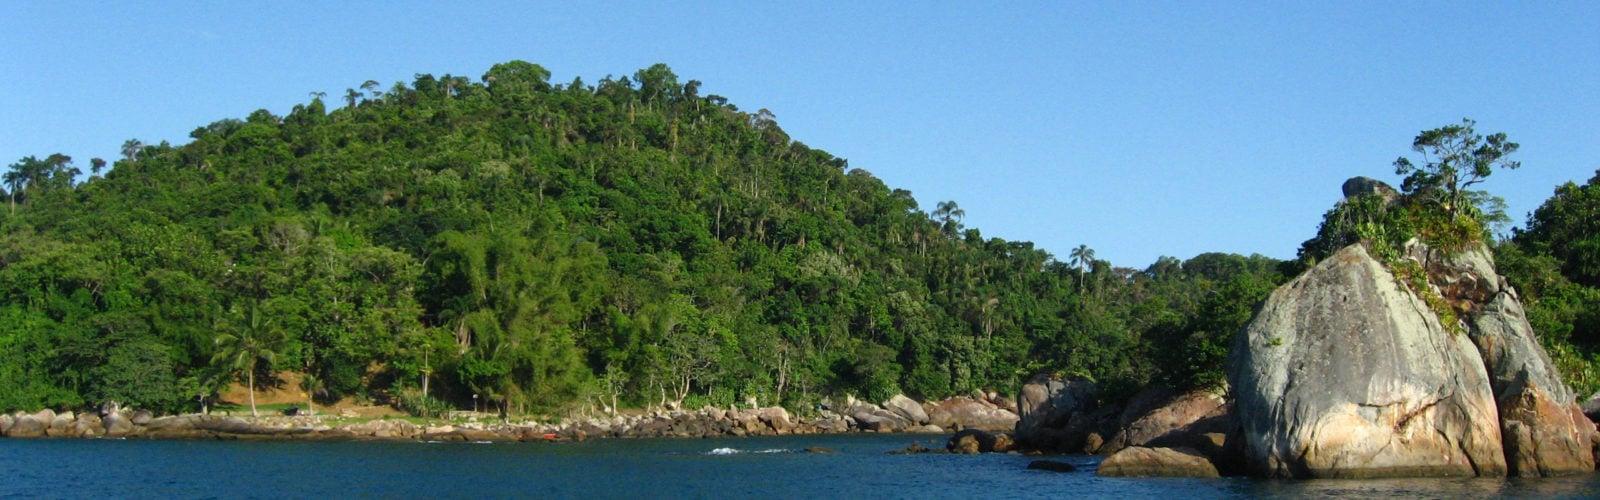 picinguaba-landscape